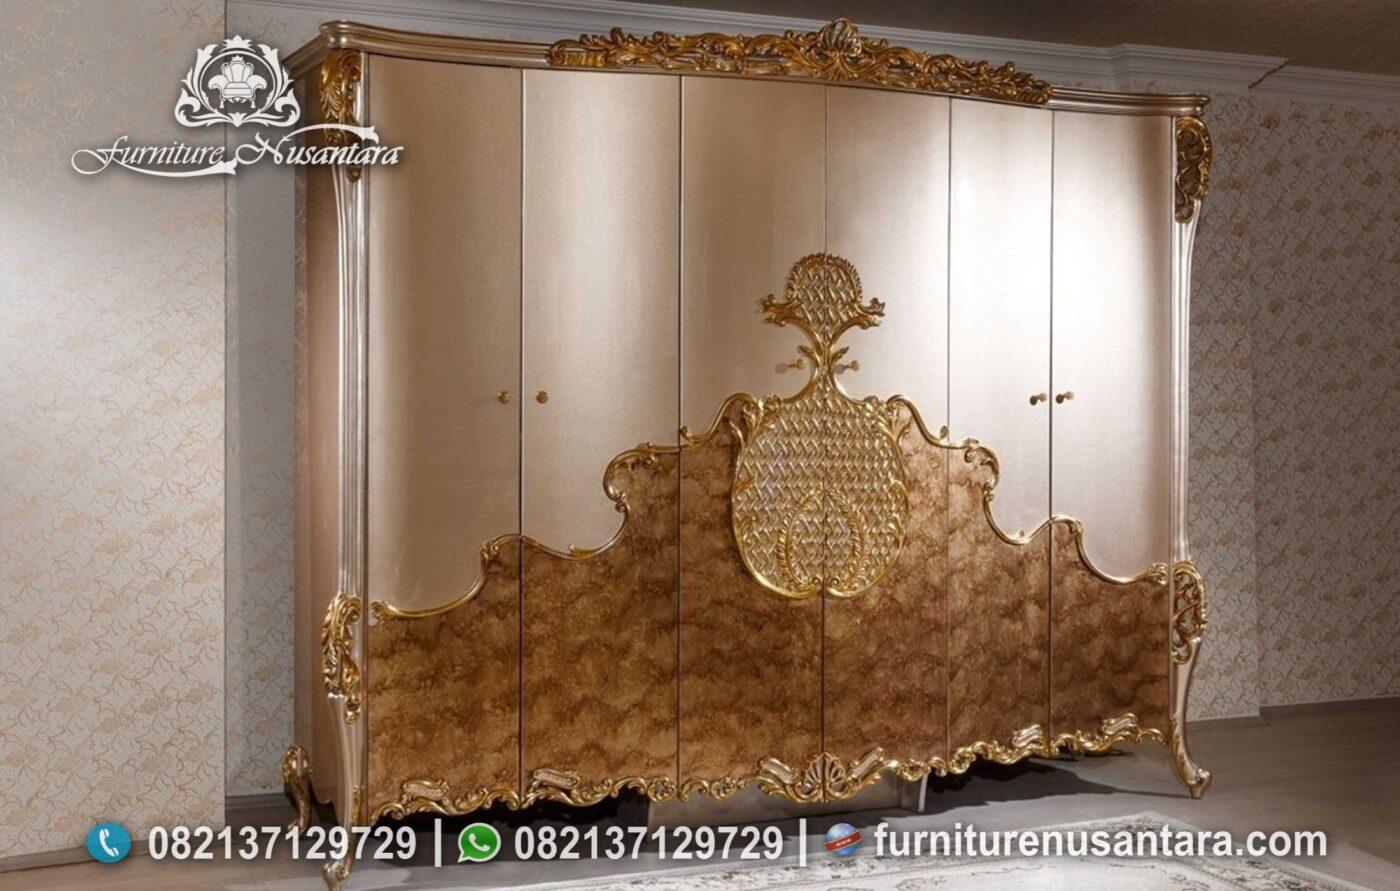 Tempat Tidur Warna Emas Ukir Mewah KS-255, Furniture Nusantara